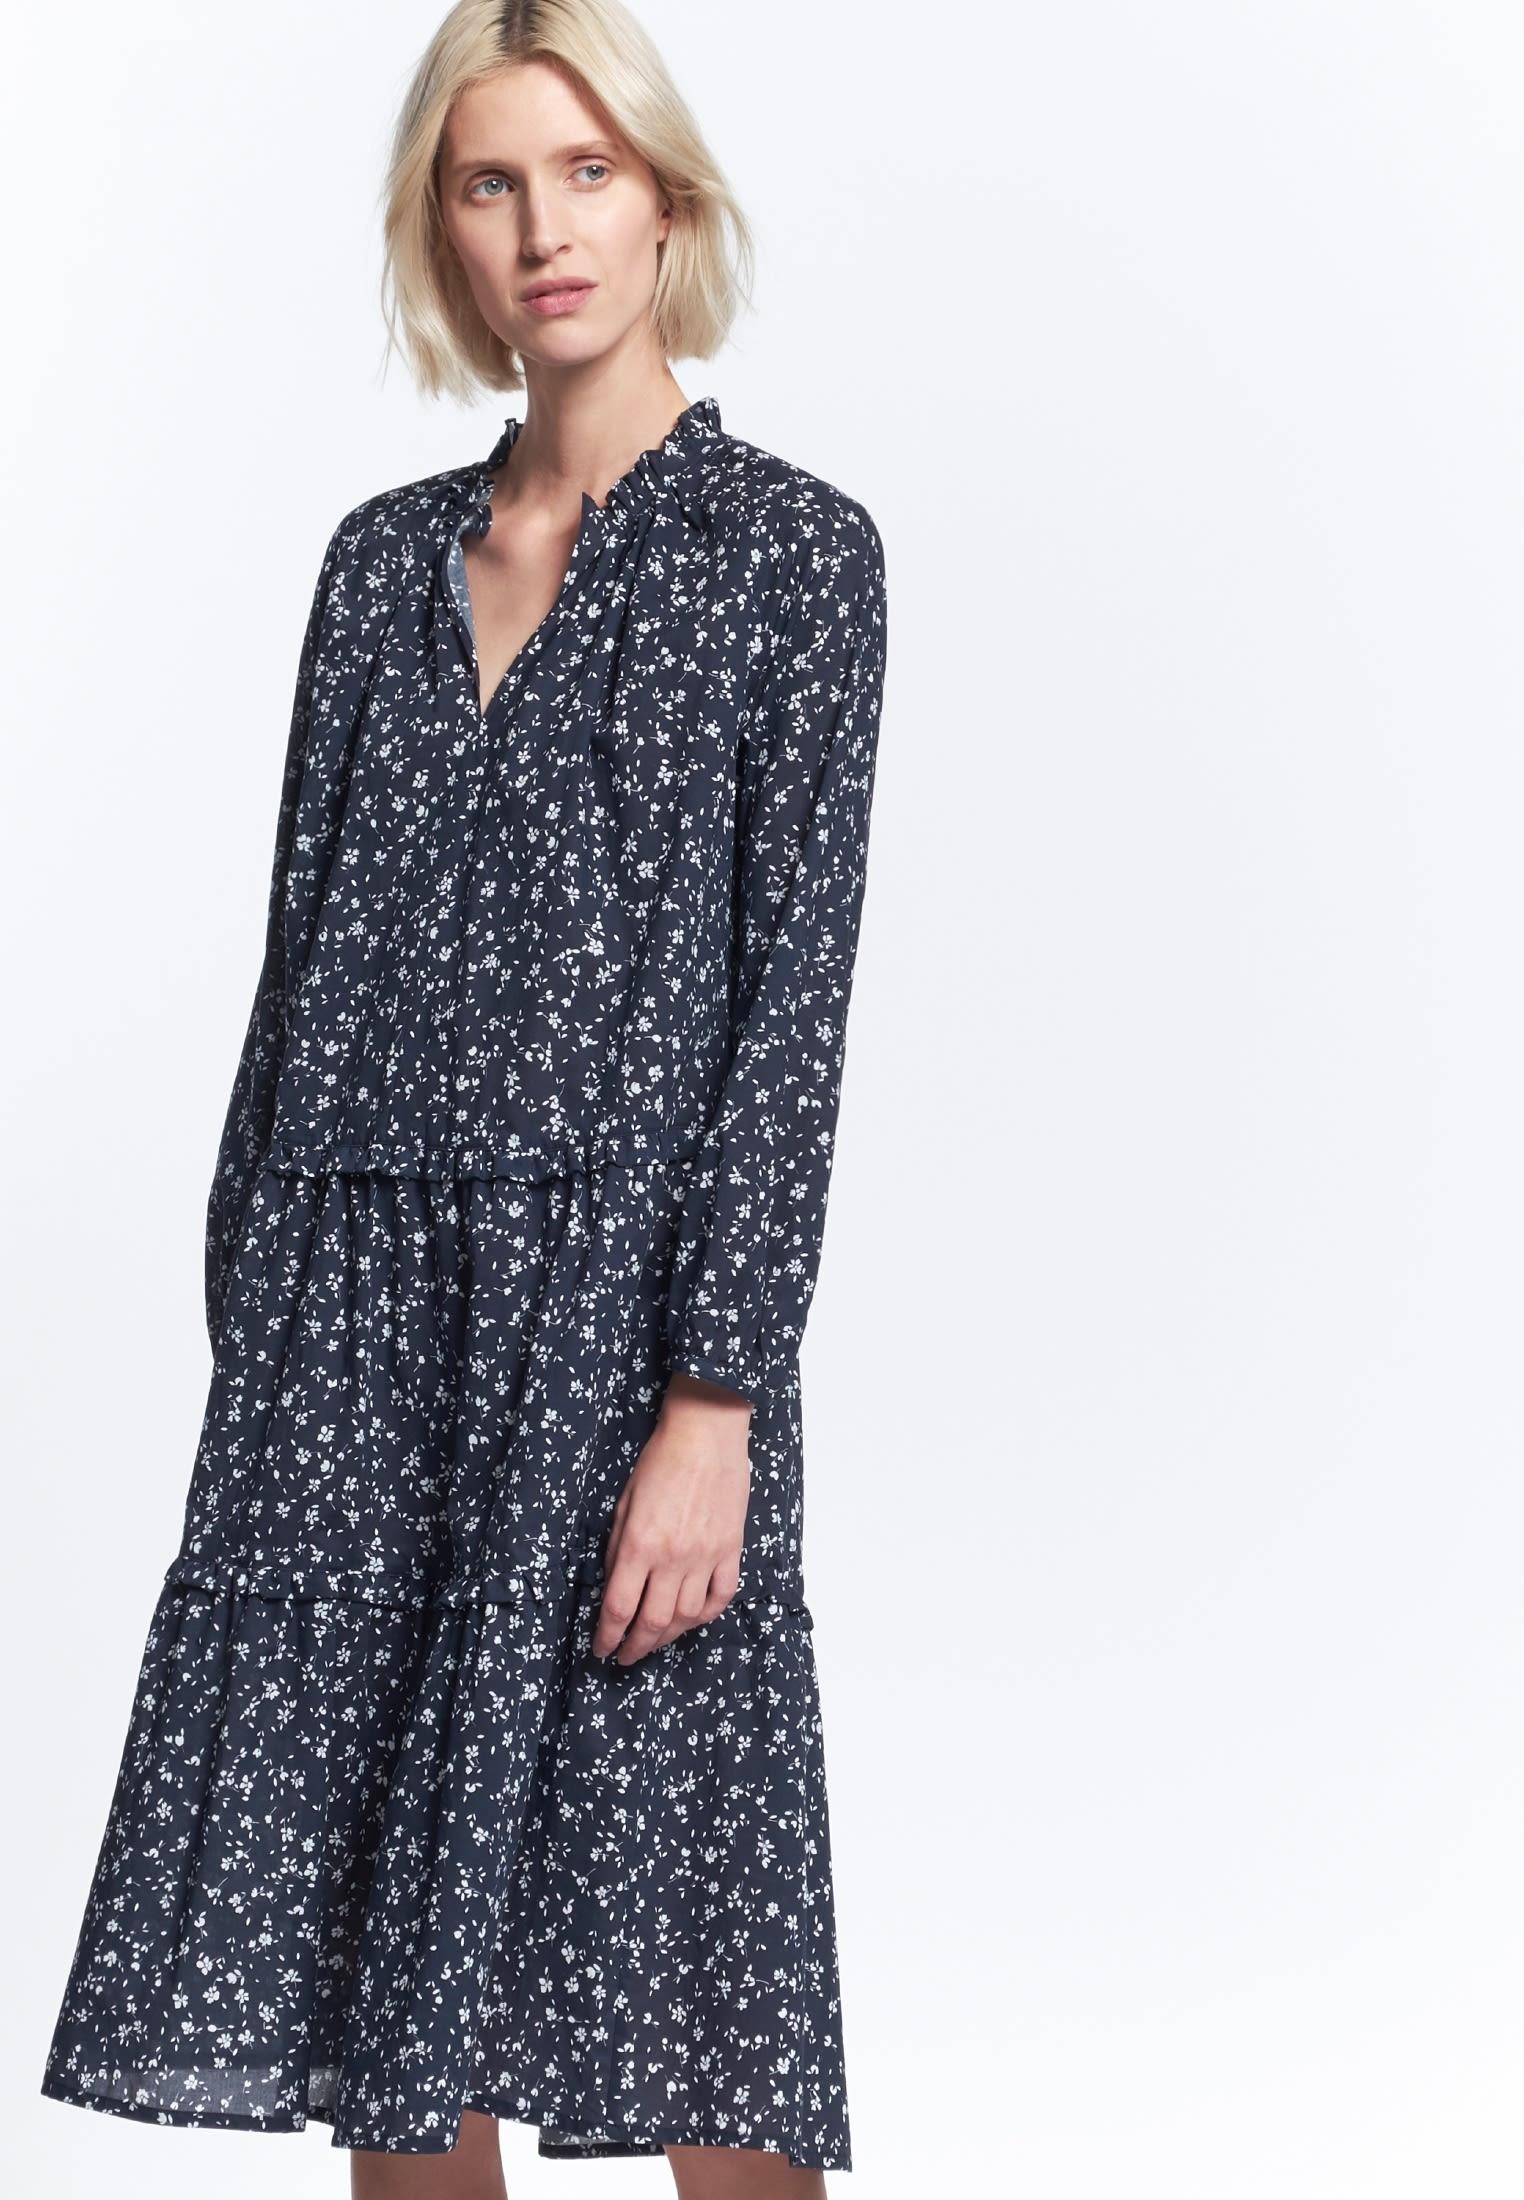 Voile Midi Kleid aus 18% Baumwolle